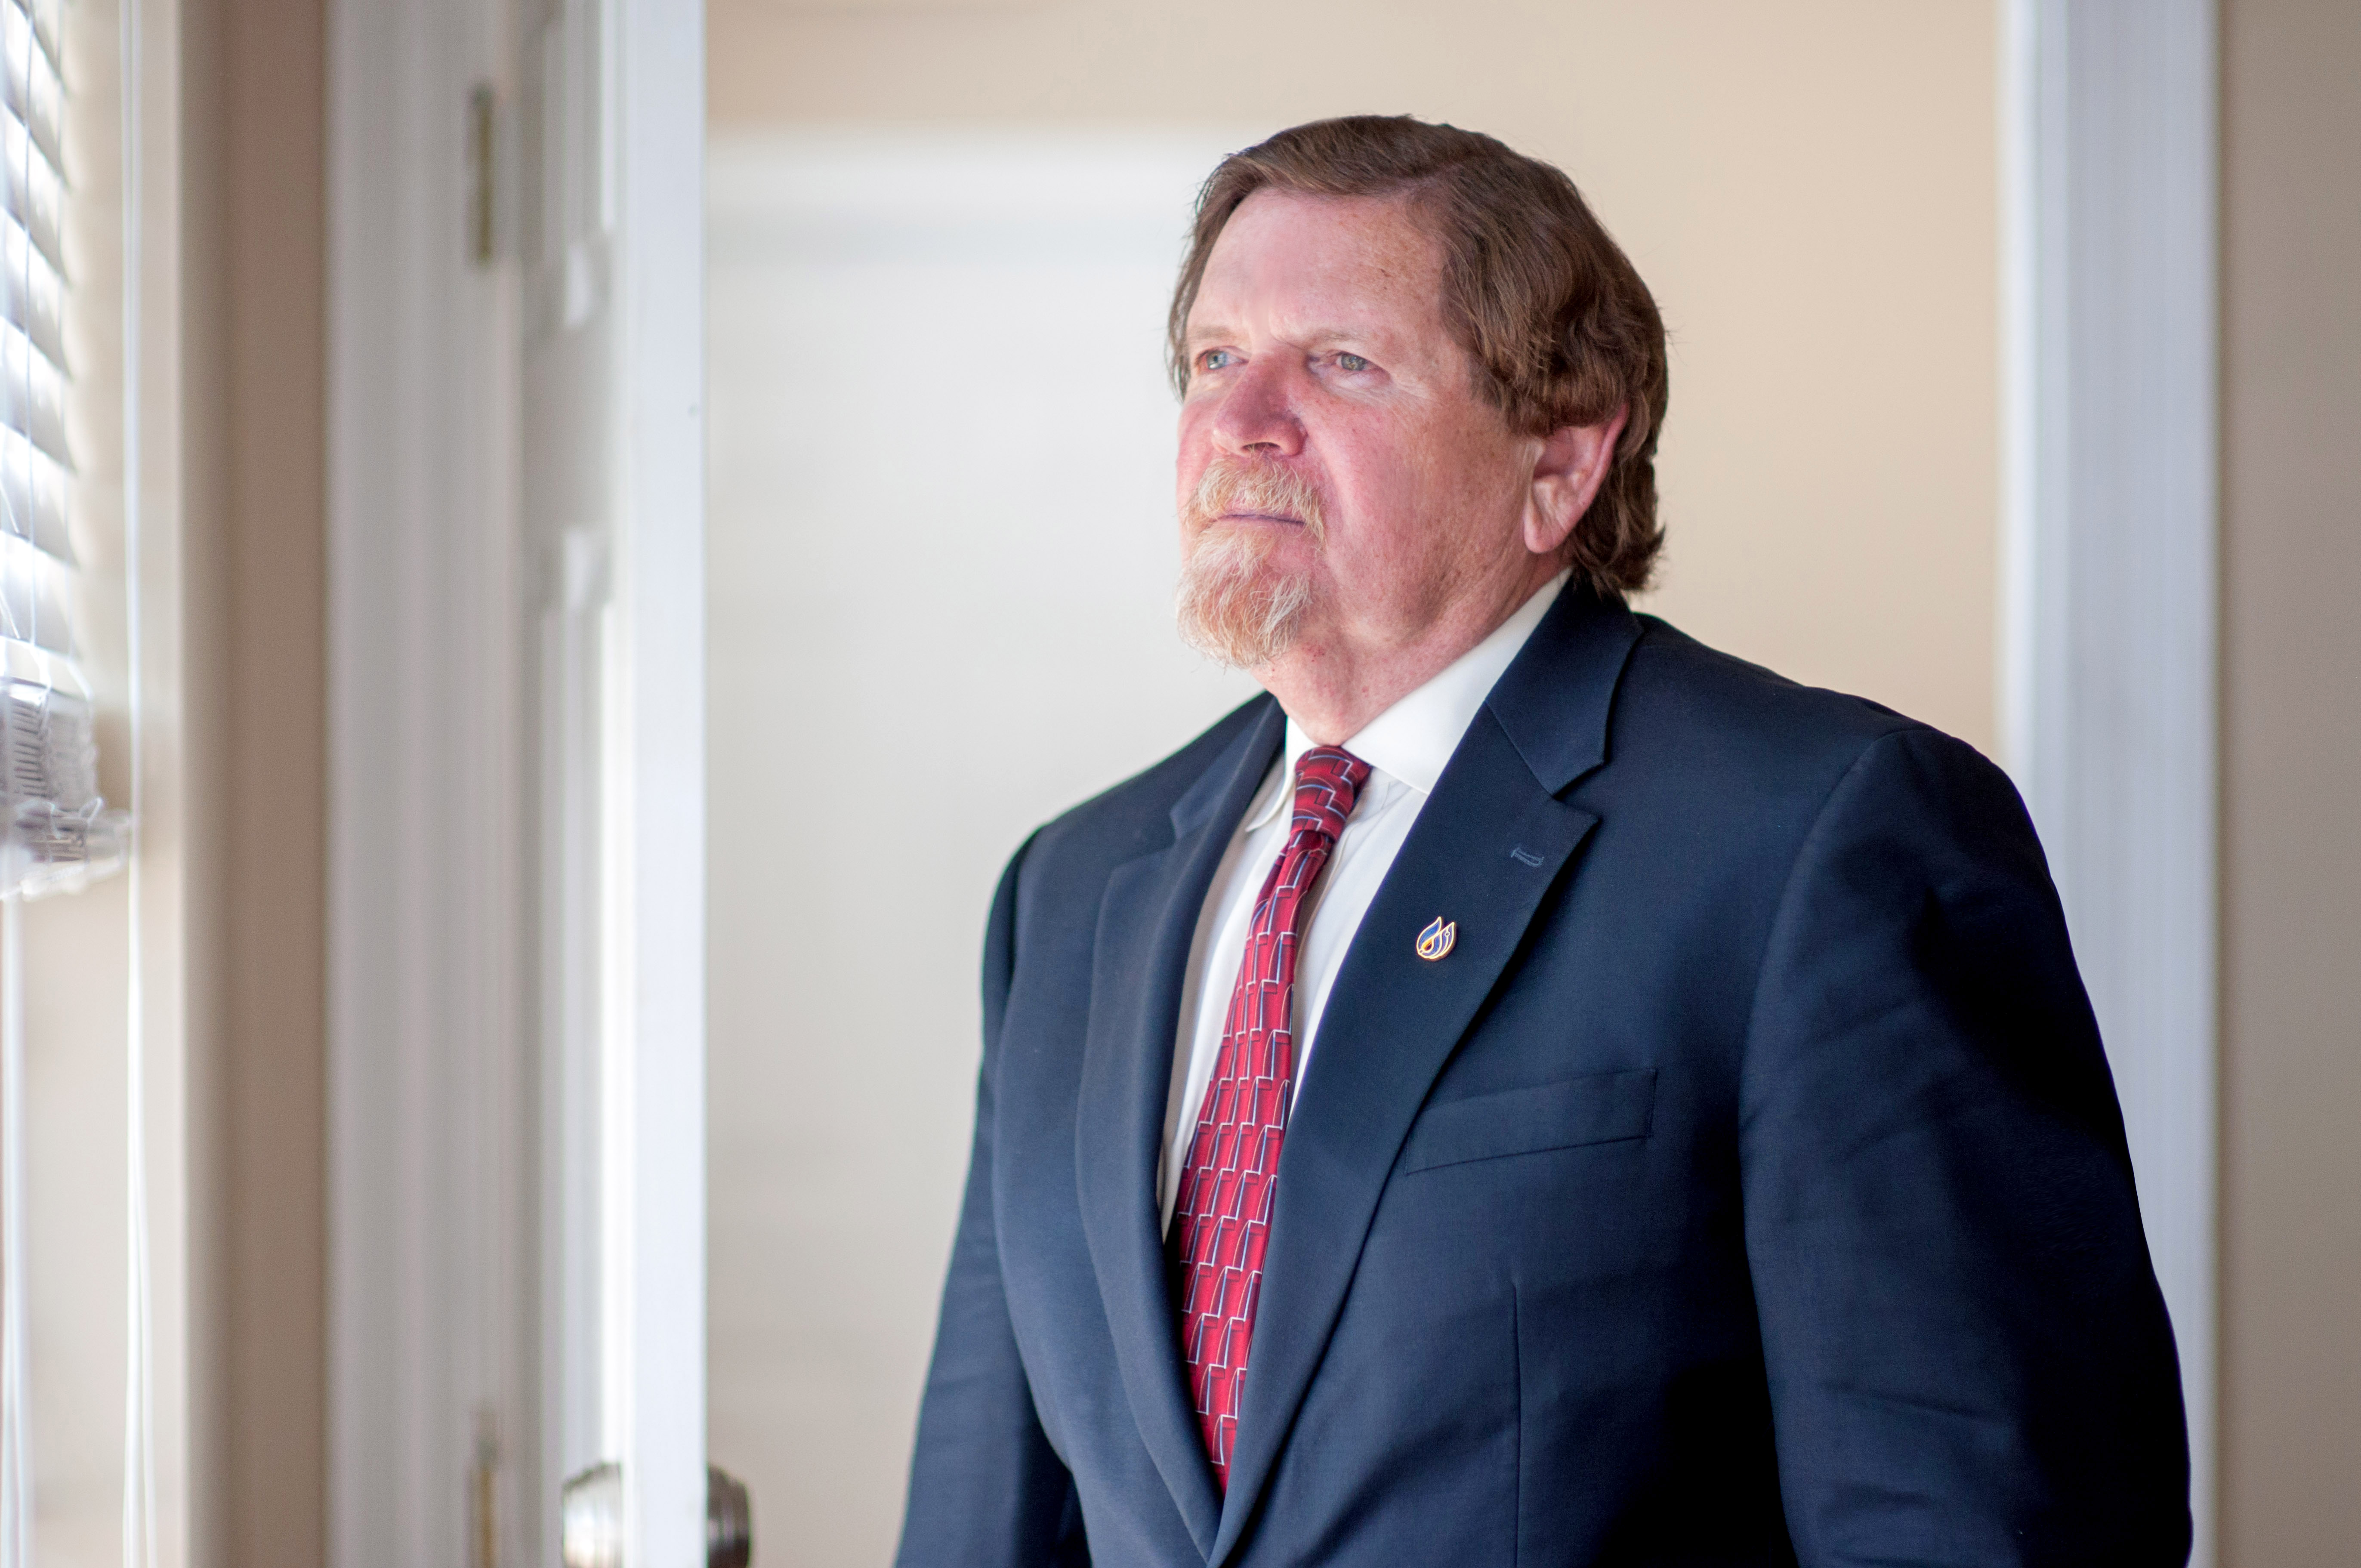 Jim Newport